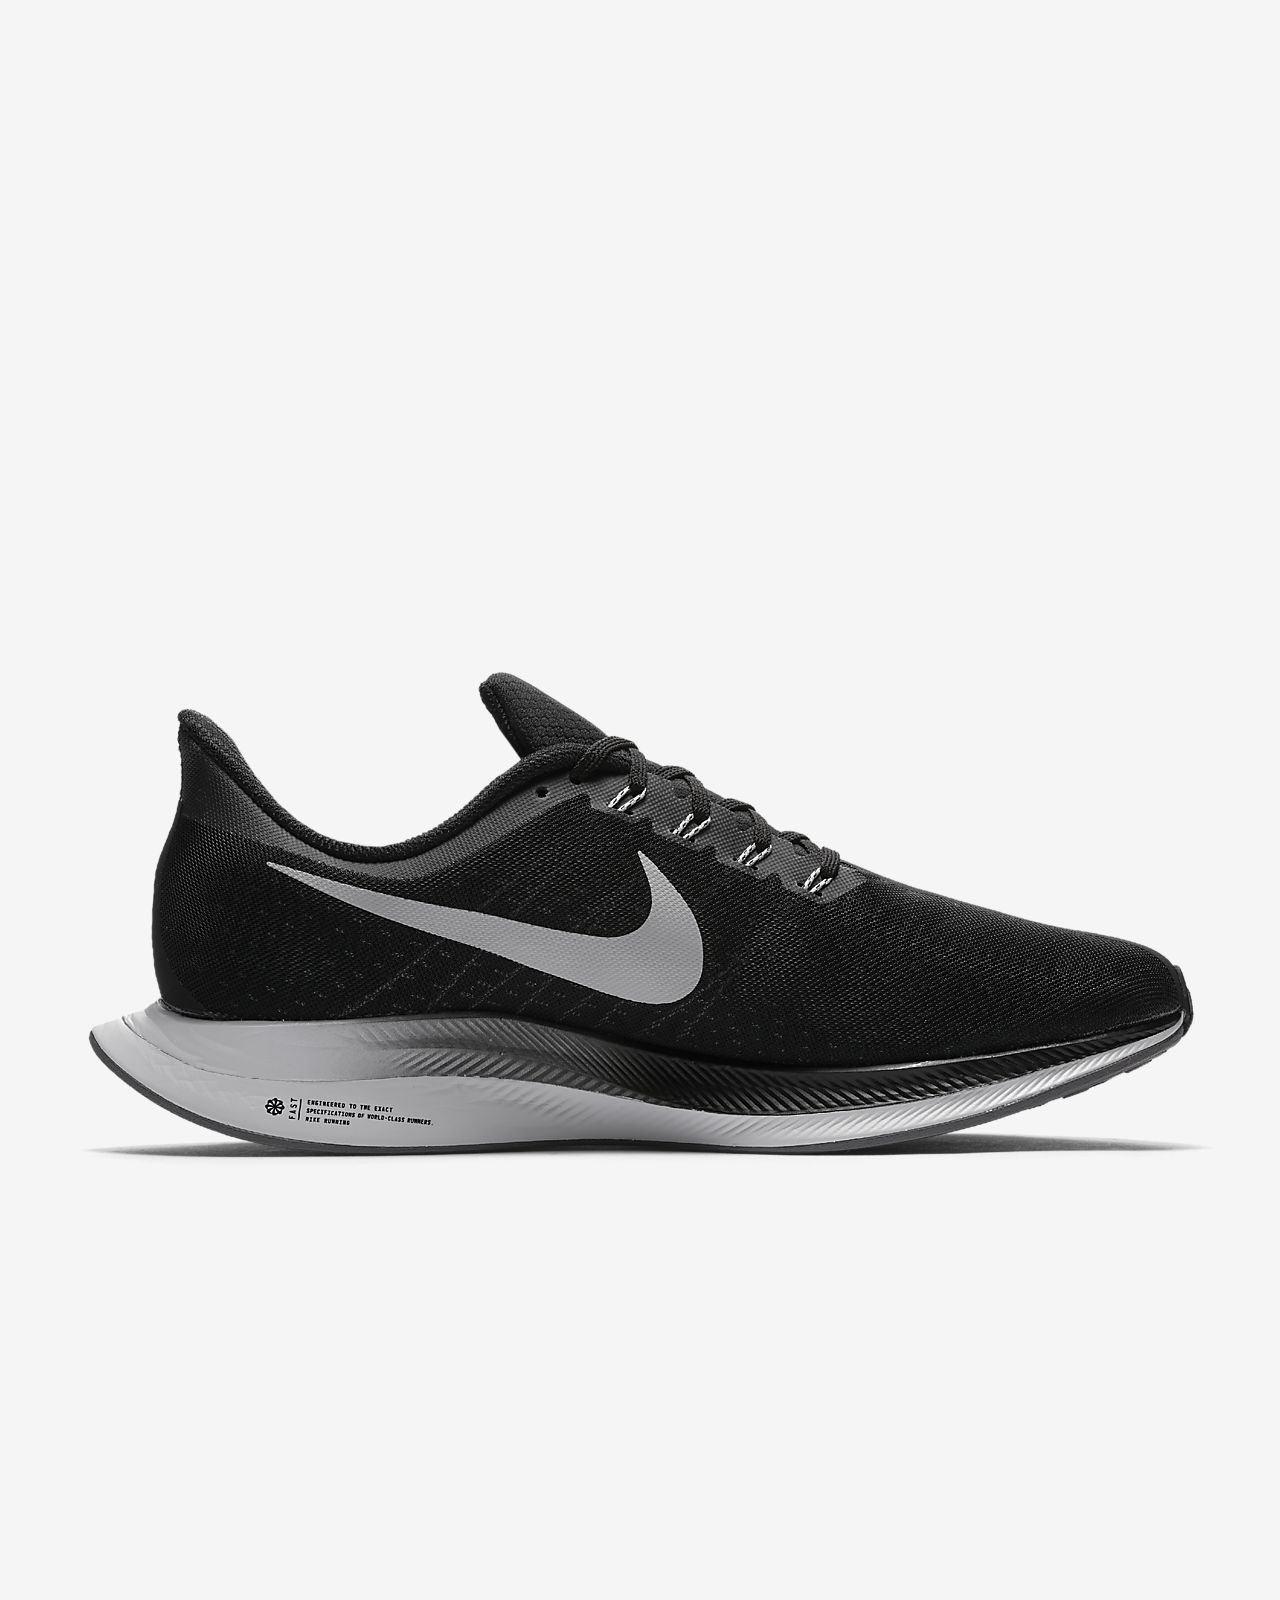 13e57987dad671 Nike Zoom Pegasus Turbo Men s Running Shoe. Nike.com